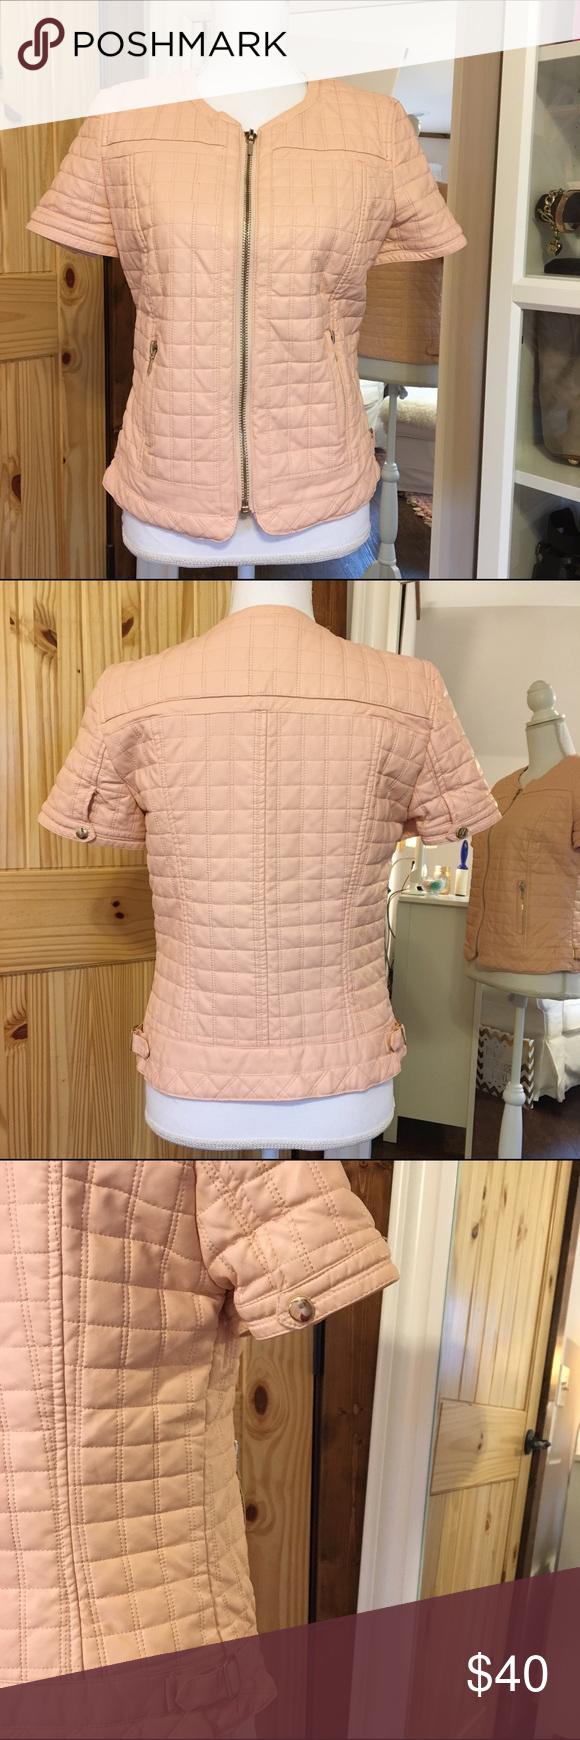 Zara Short Sleeve Faux Leather Jacket Zara Trafaluc